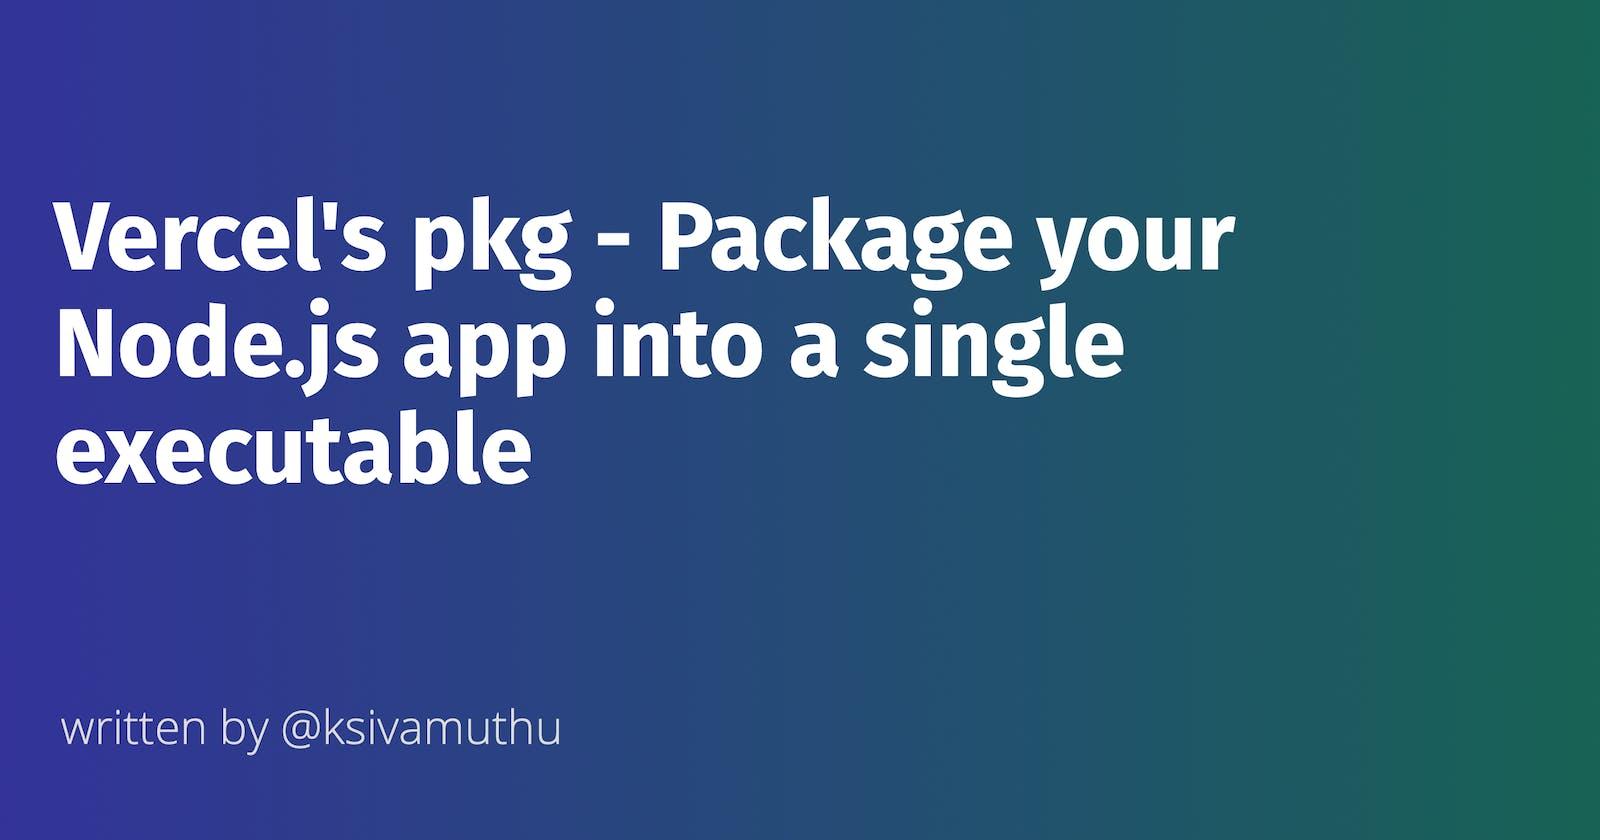 Vercel's pkg - Package your Node.js app into a single executable